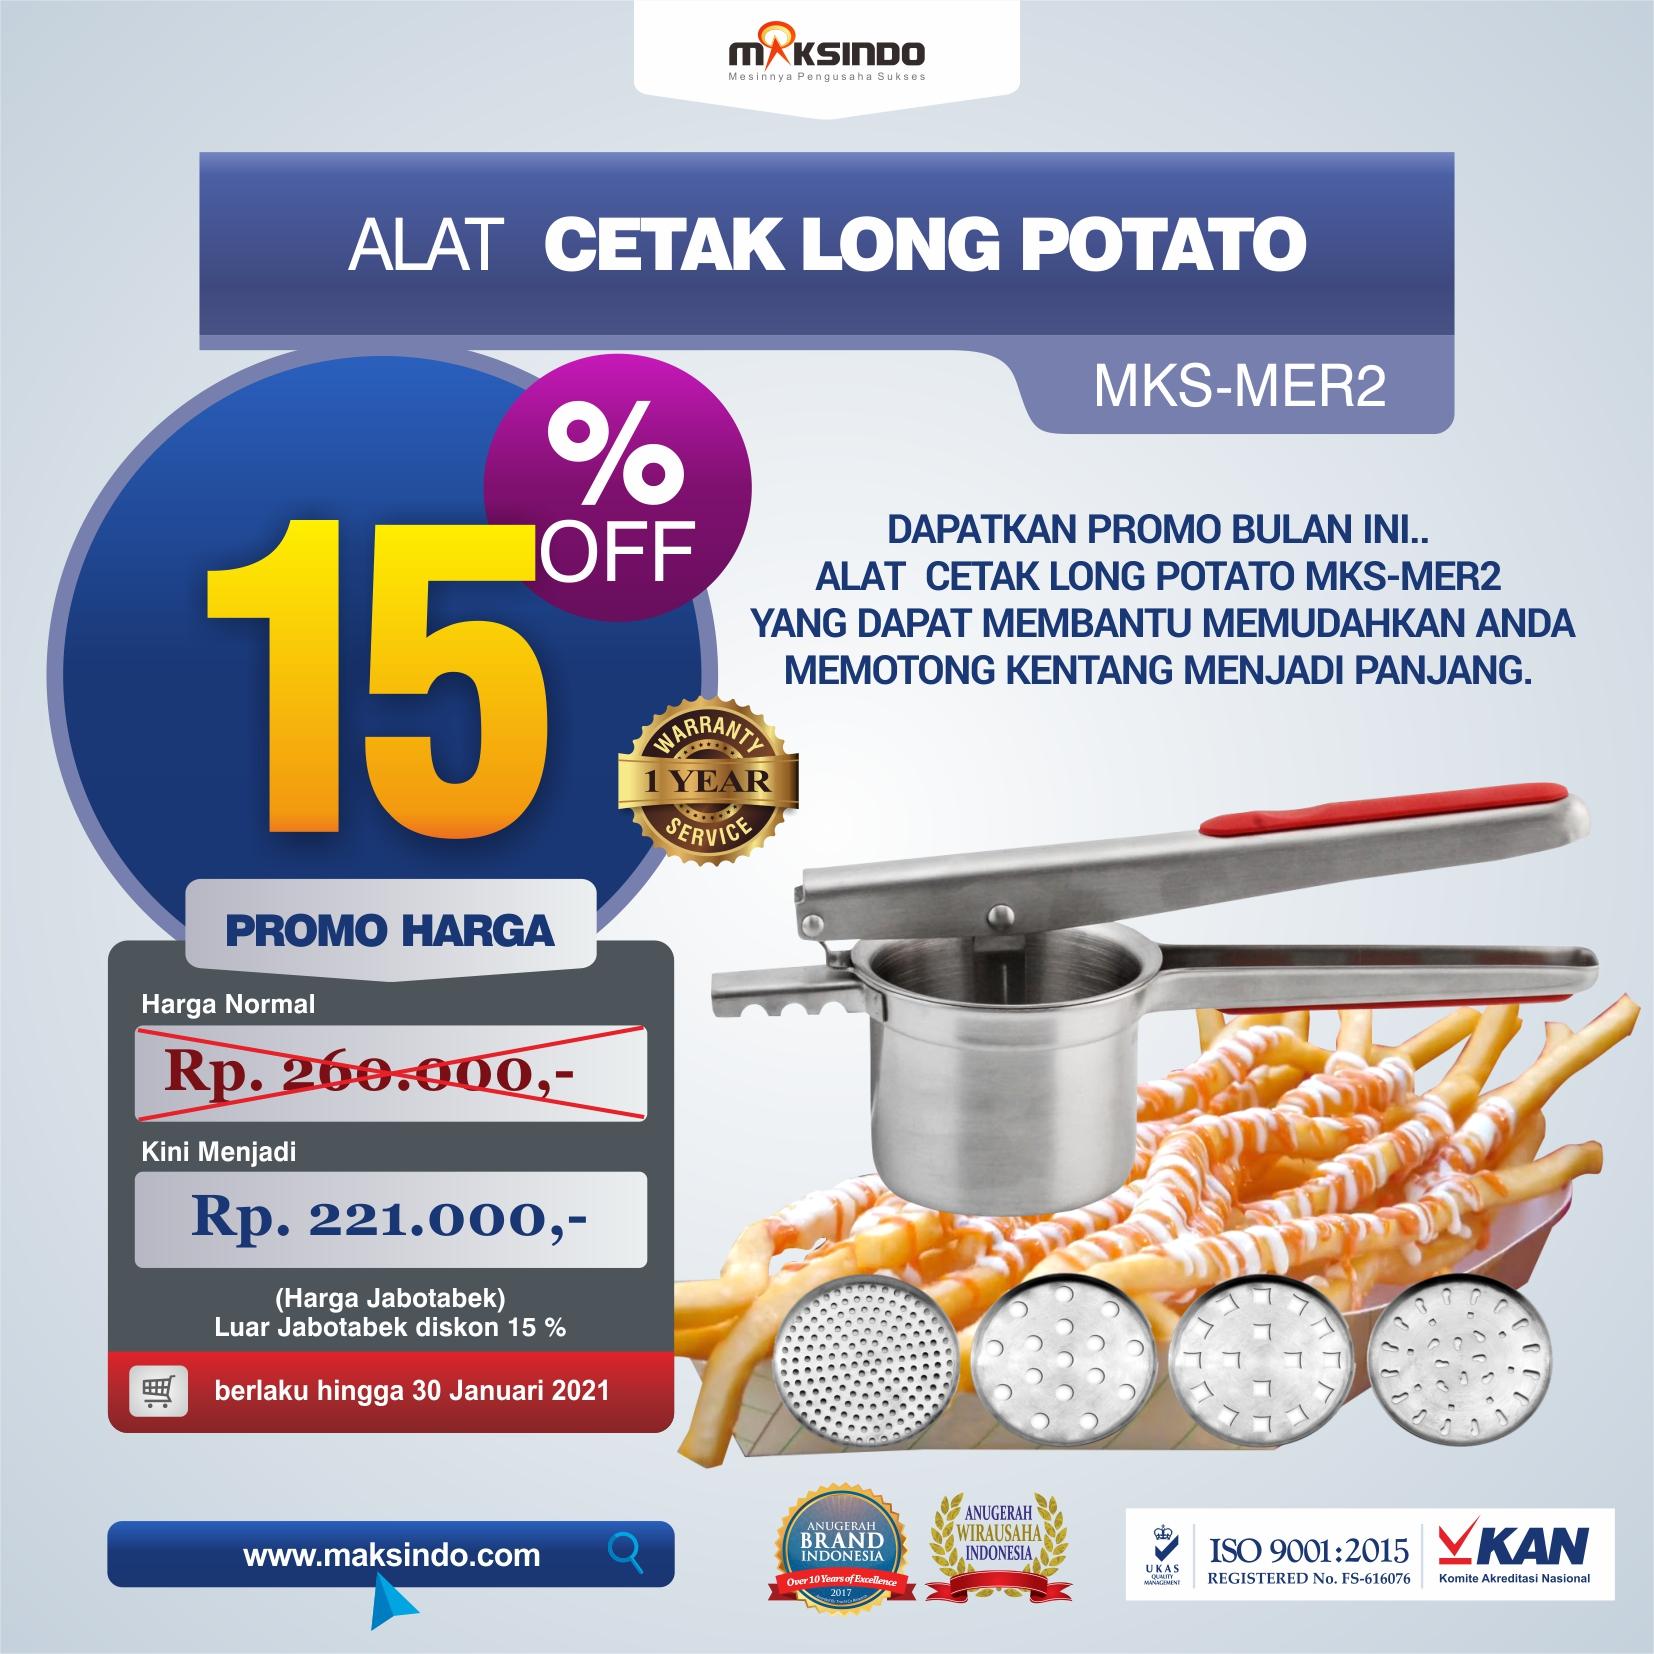 Jual Alat Cetak Long Potato MKS-MER2 di Bekasi